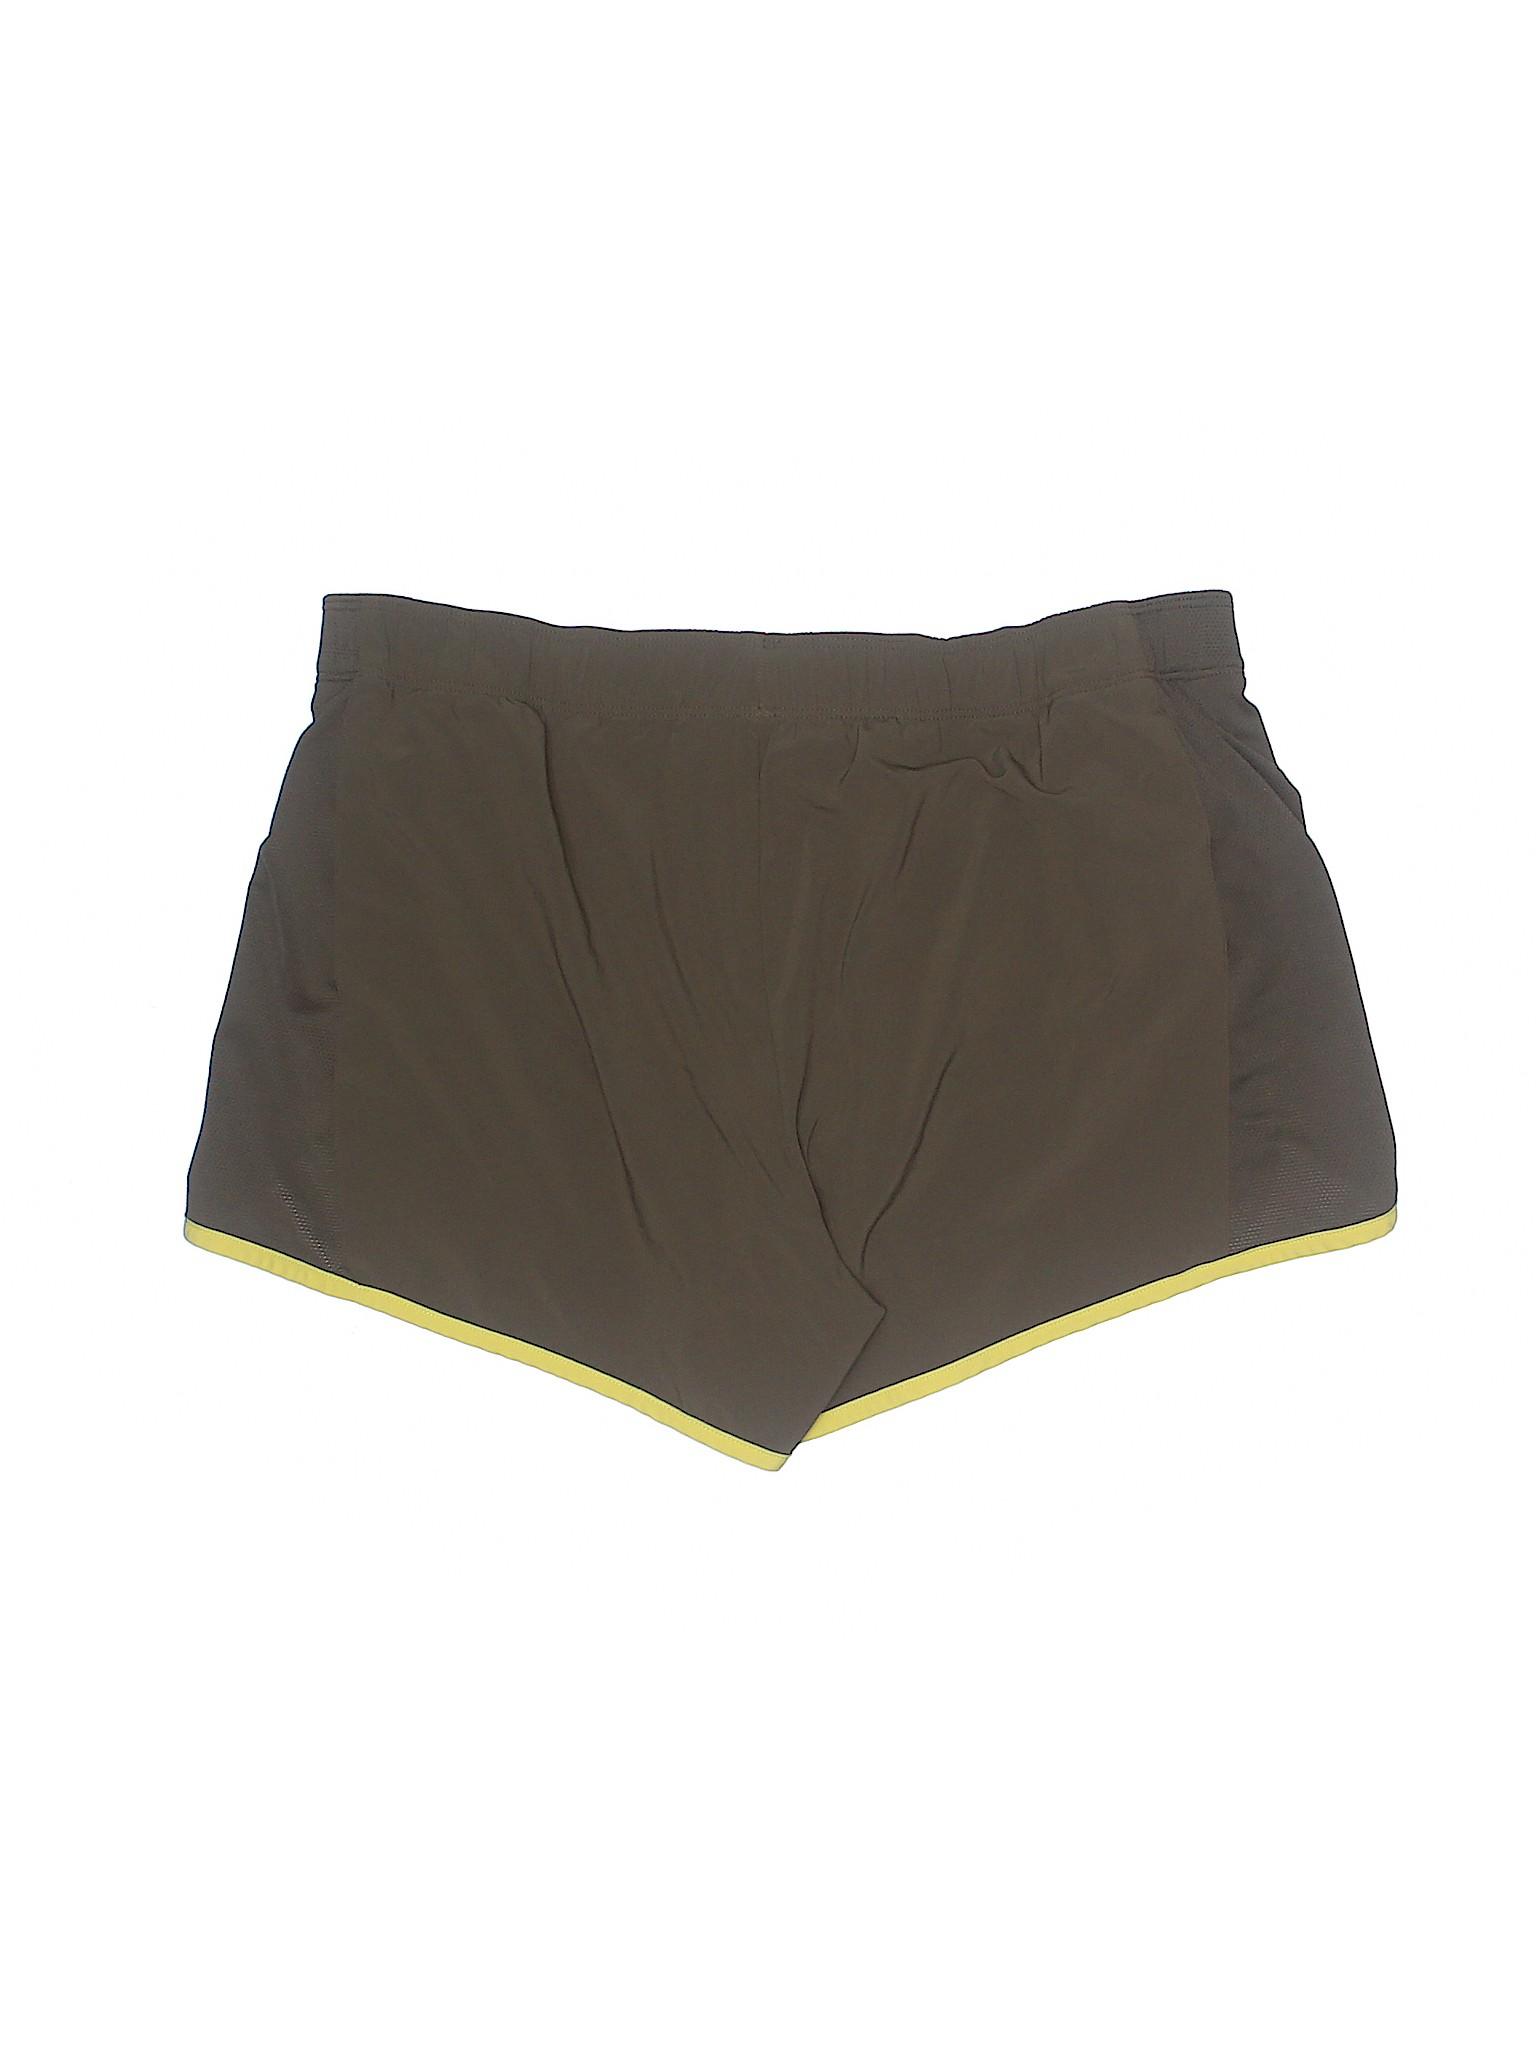 Gap Shorts Boutique Body Athletic leisure HnXFqX